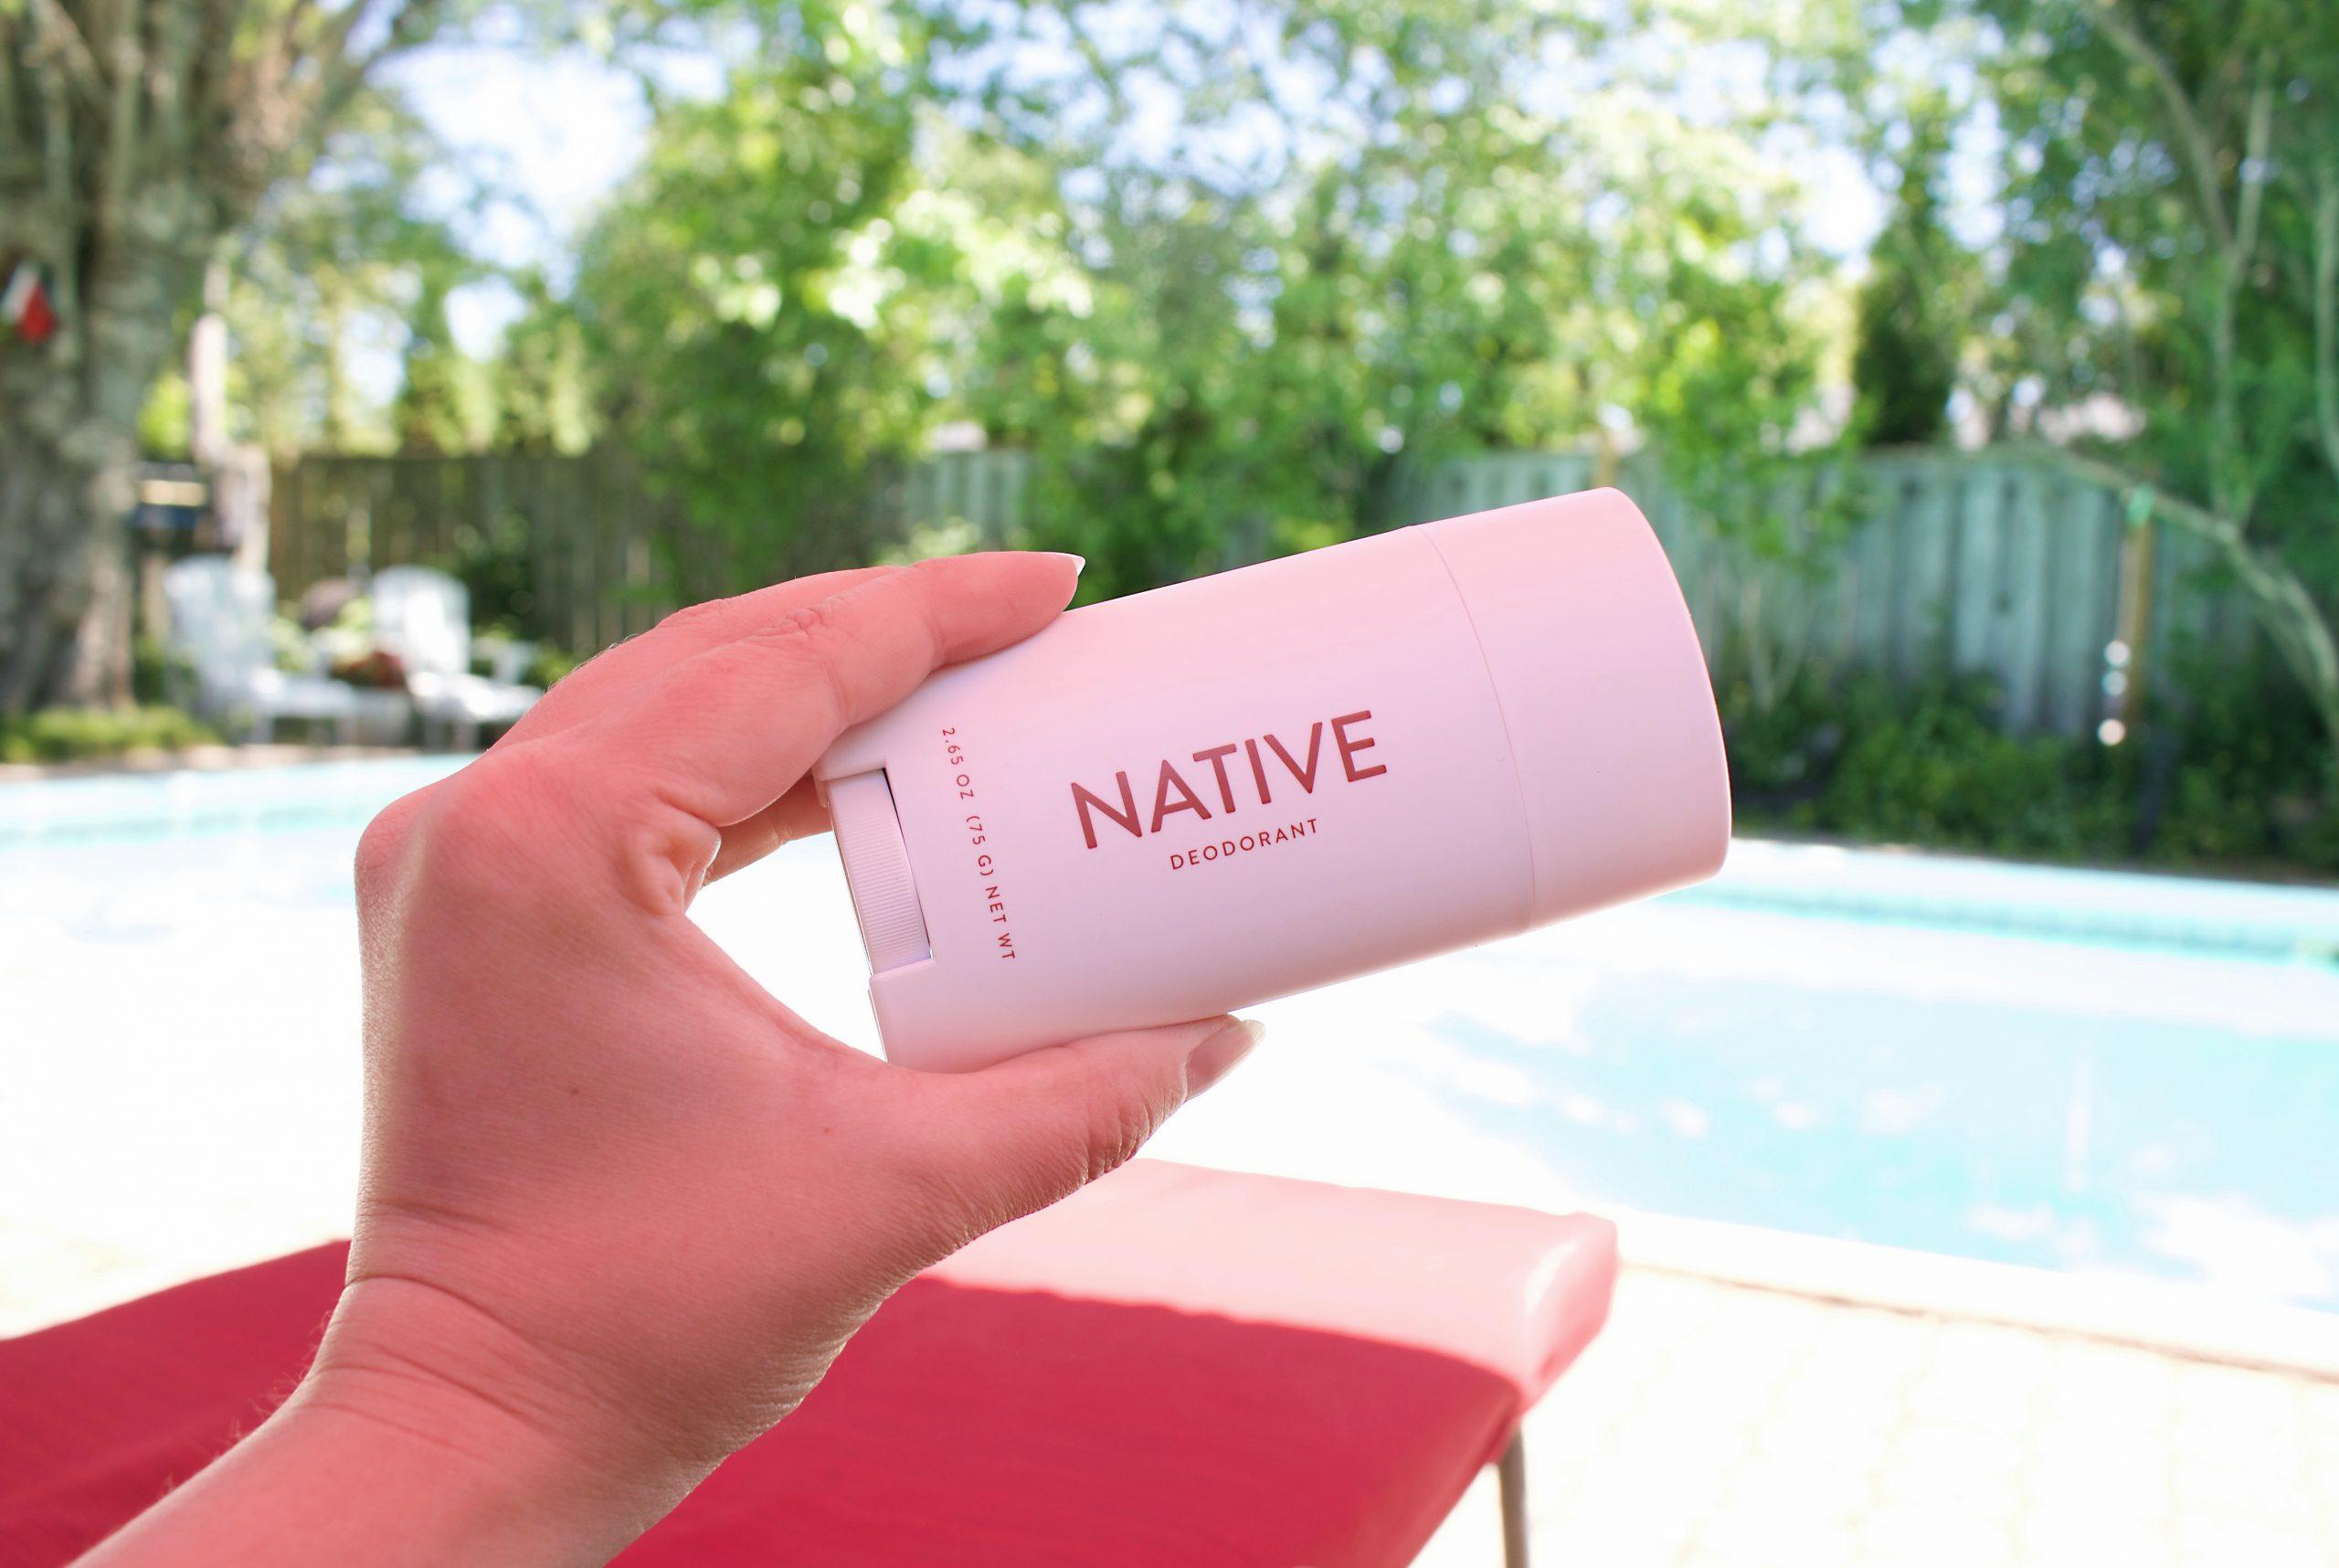 The Natural Deodorant I Didn't Like